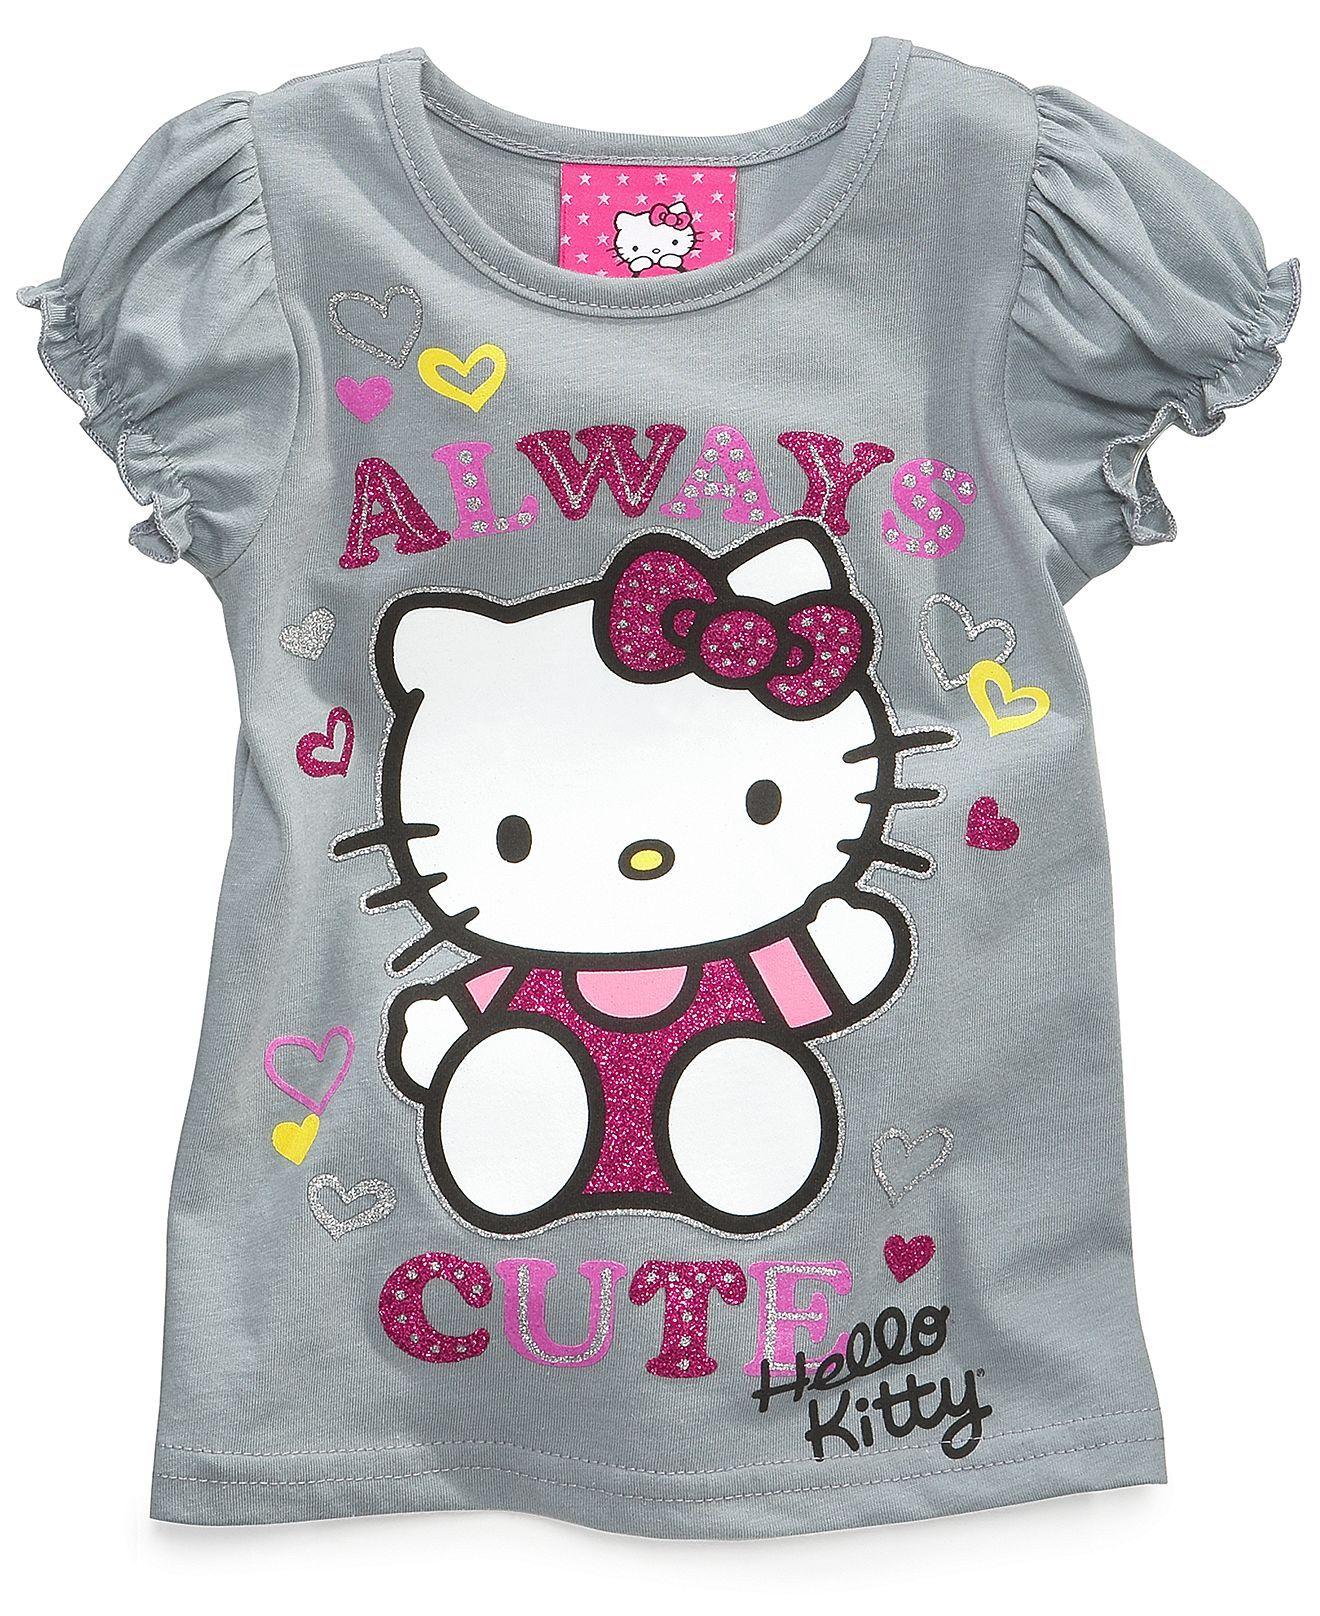 Hello Kitty Kids Shirts Little Girls Glitter Graphic Tees